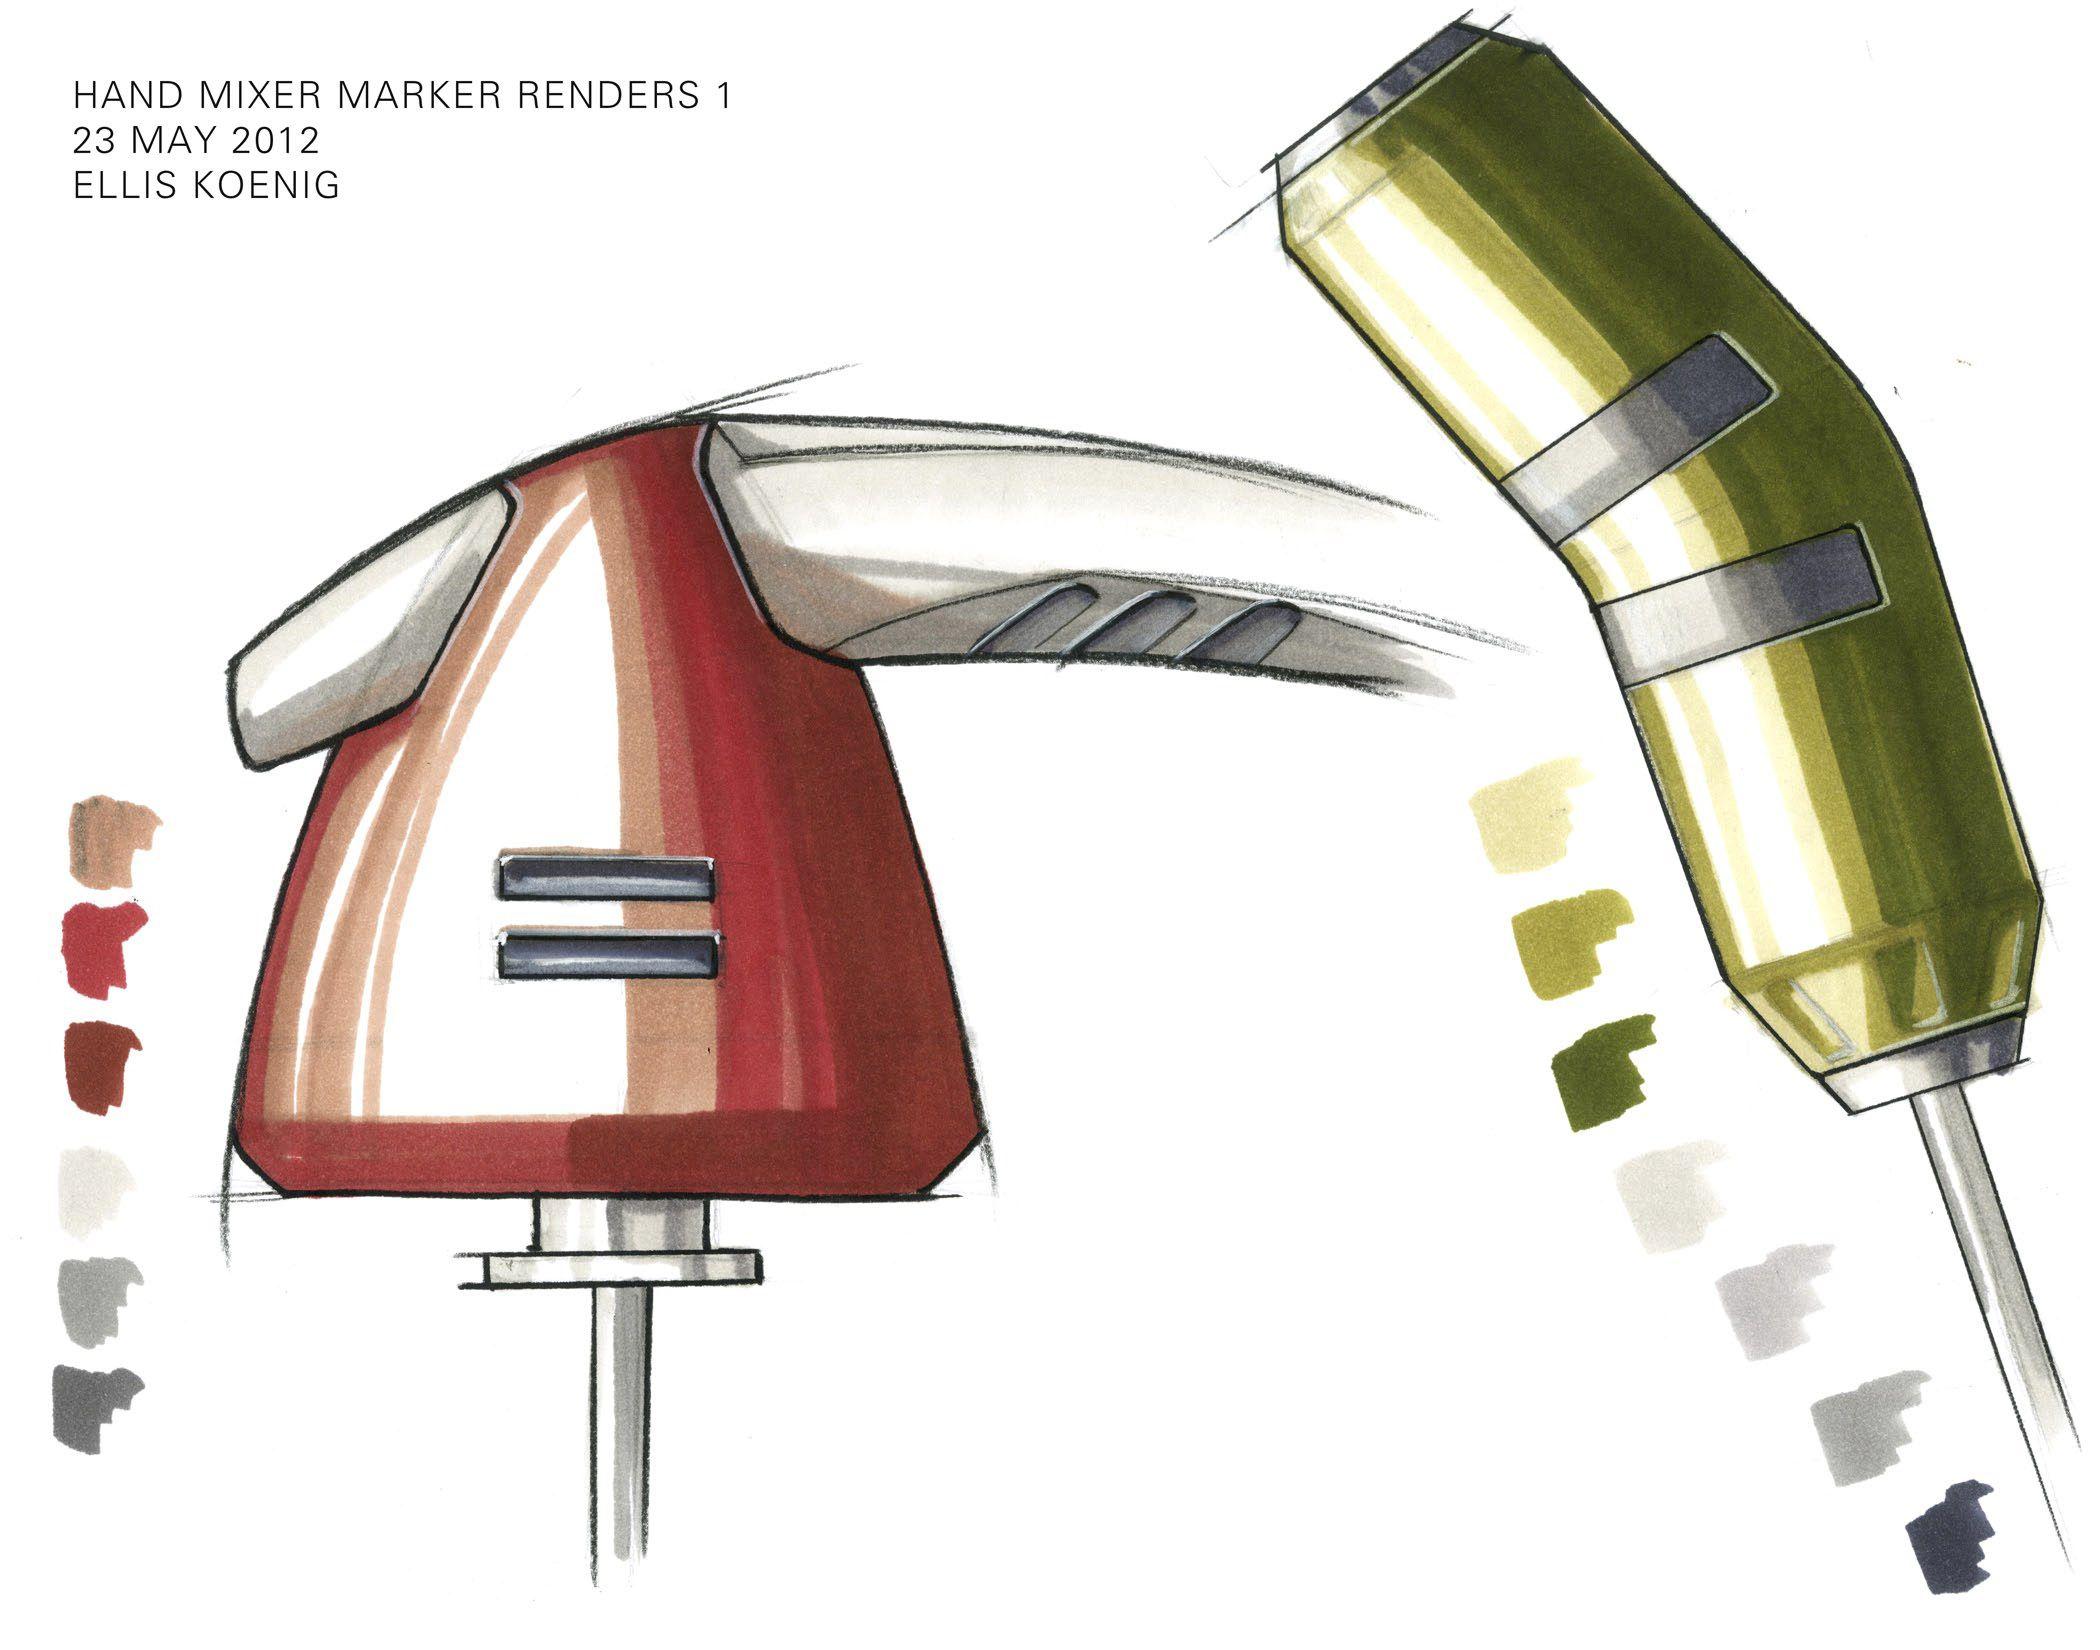 hand mixer marker renderings by ellis koenig t cnicas repres gr fica pinterest hand mixer. Black Bedroom Furniture Sets. Home Design Ideas